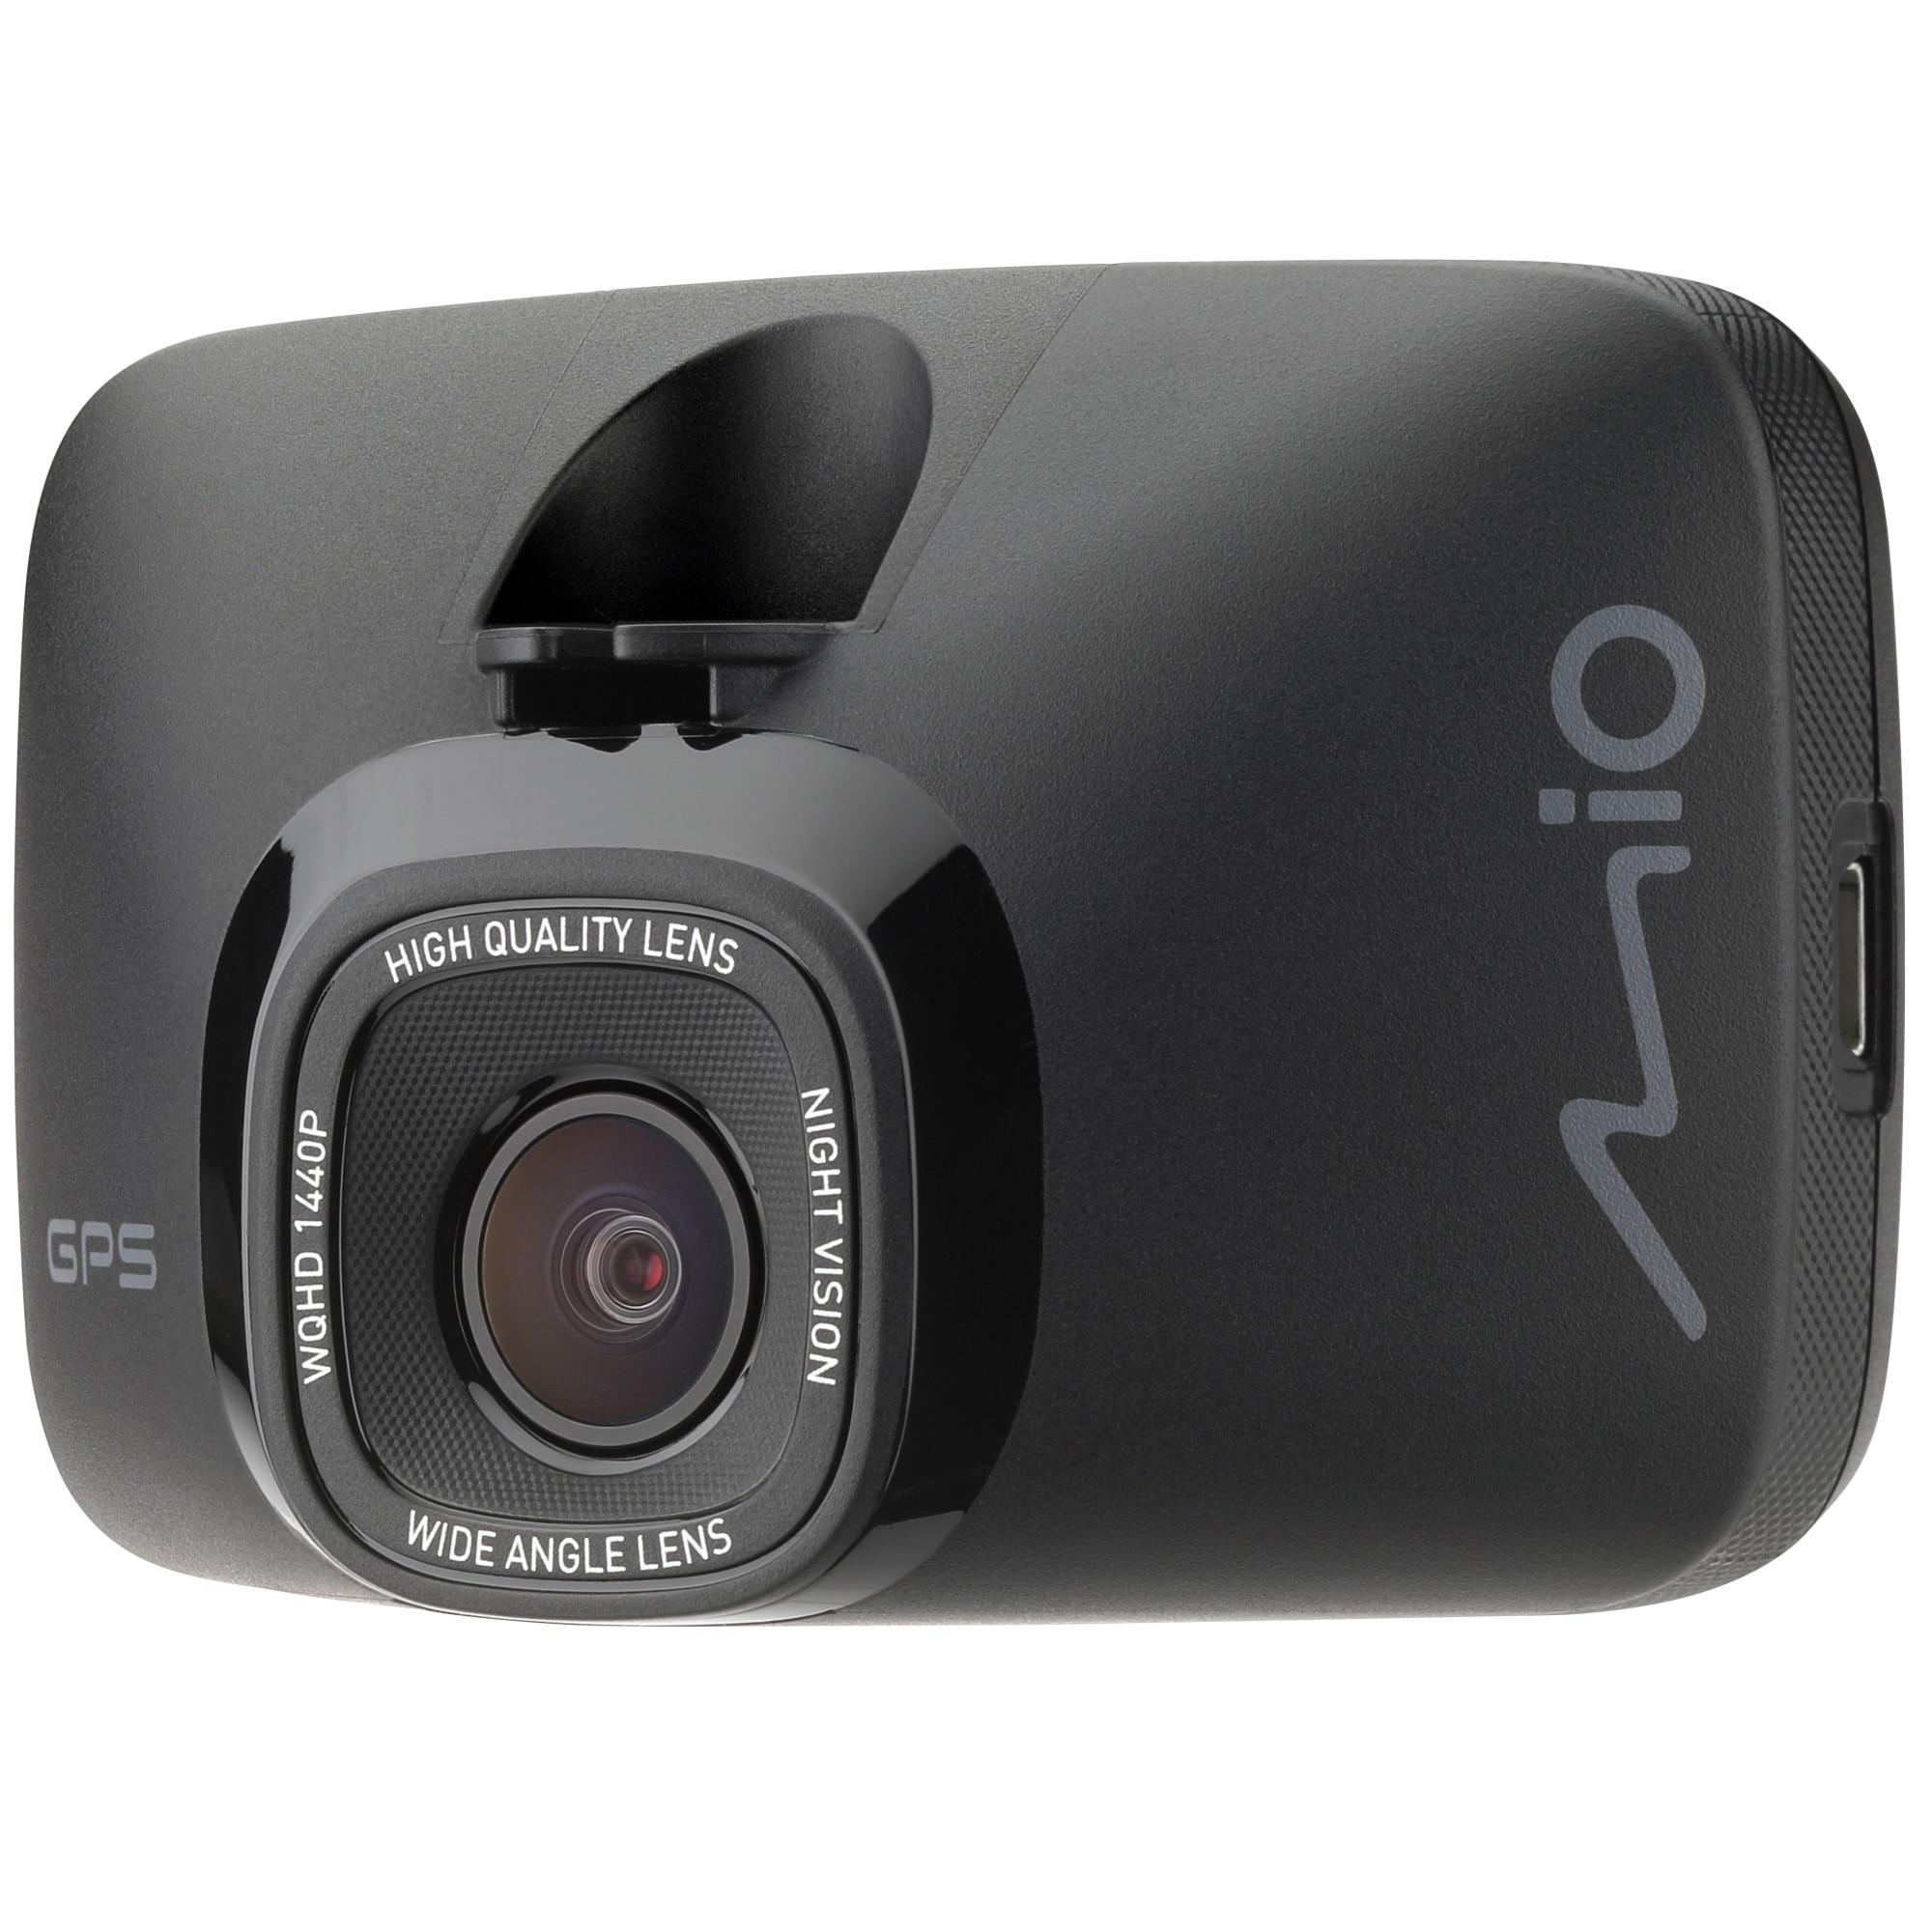 Fotografie Camera video auto MIO MiVue 812, 1440P 2K, 60fps, GPS, unghi vizualizare 140 grade